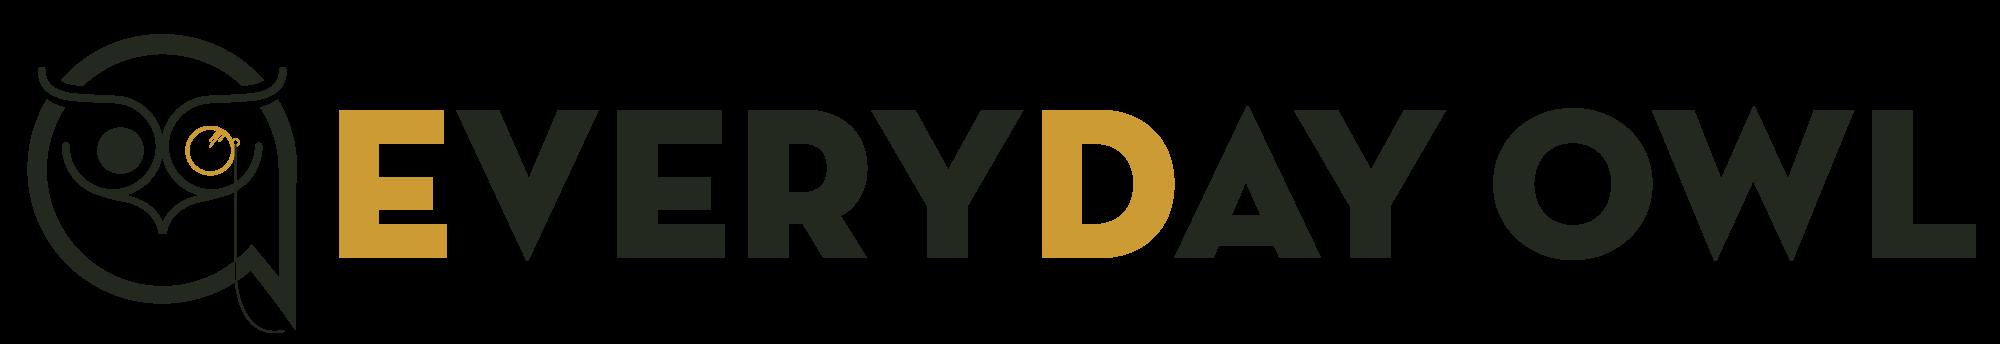 Everyday Owl logo